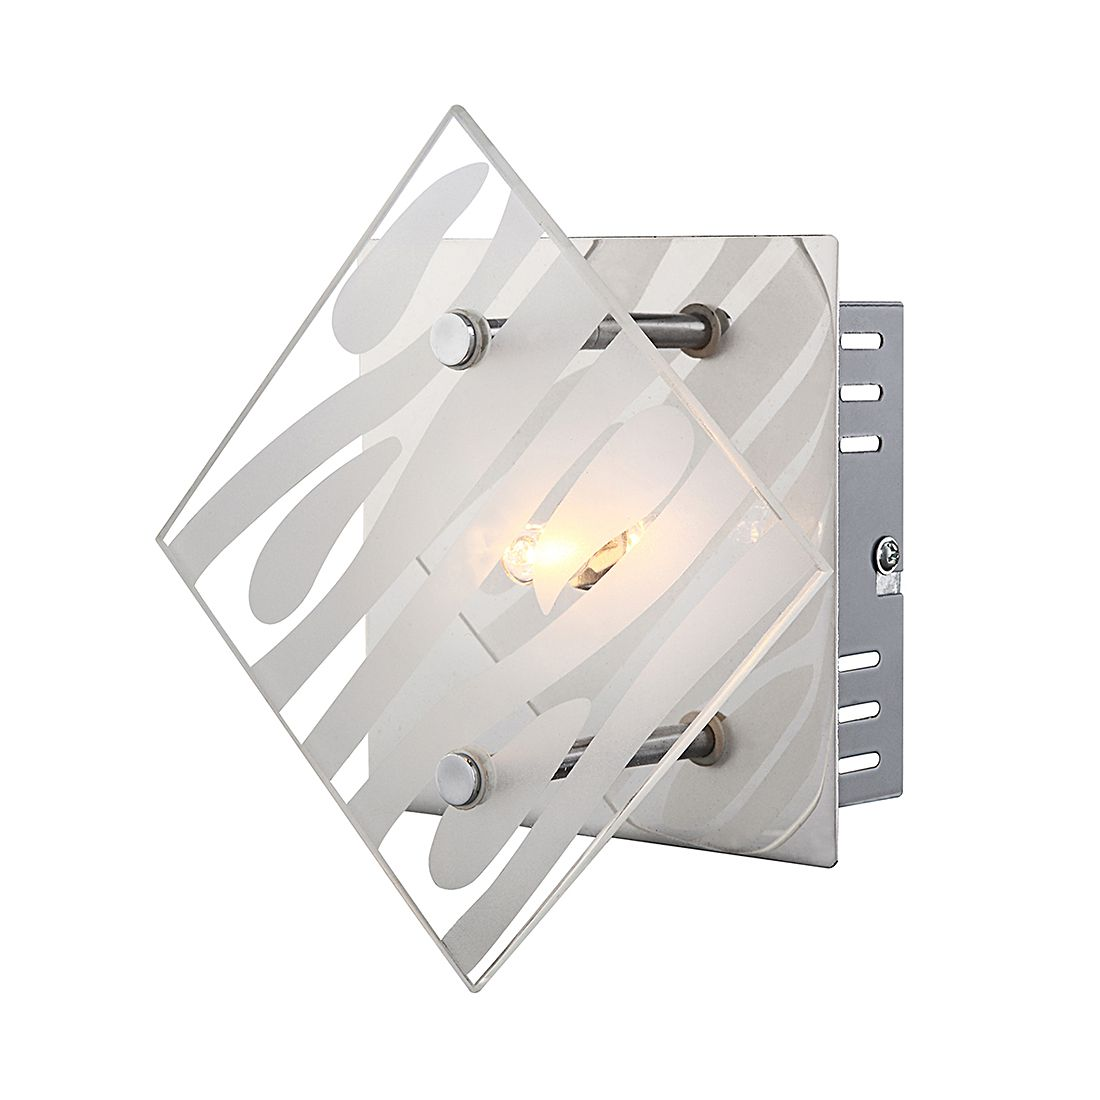 Image of energia A++, Lampada da parete Wimeron - Metallo Color argento 1 luce, Globo Lighting